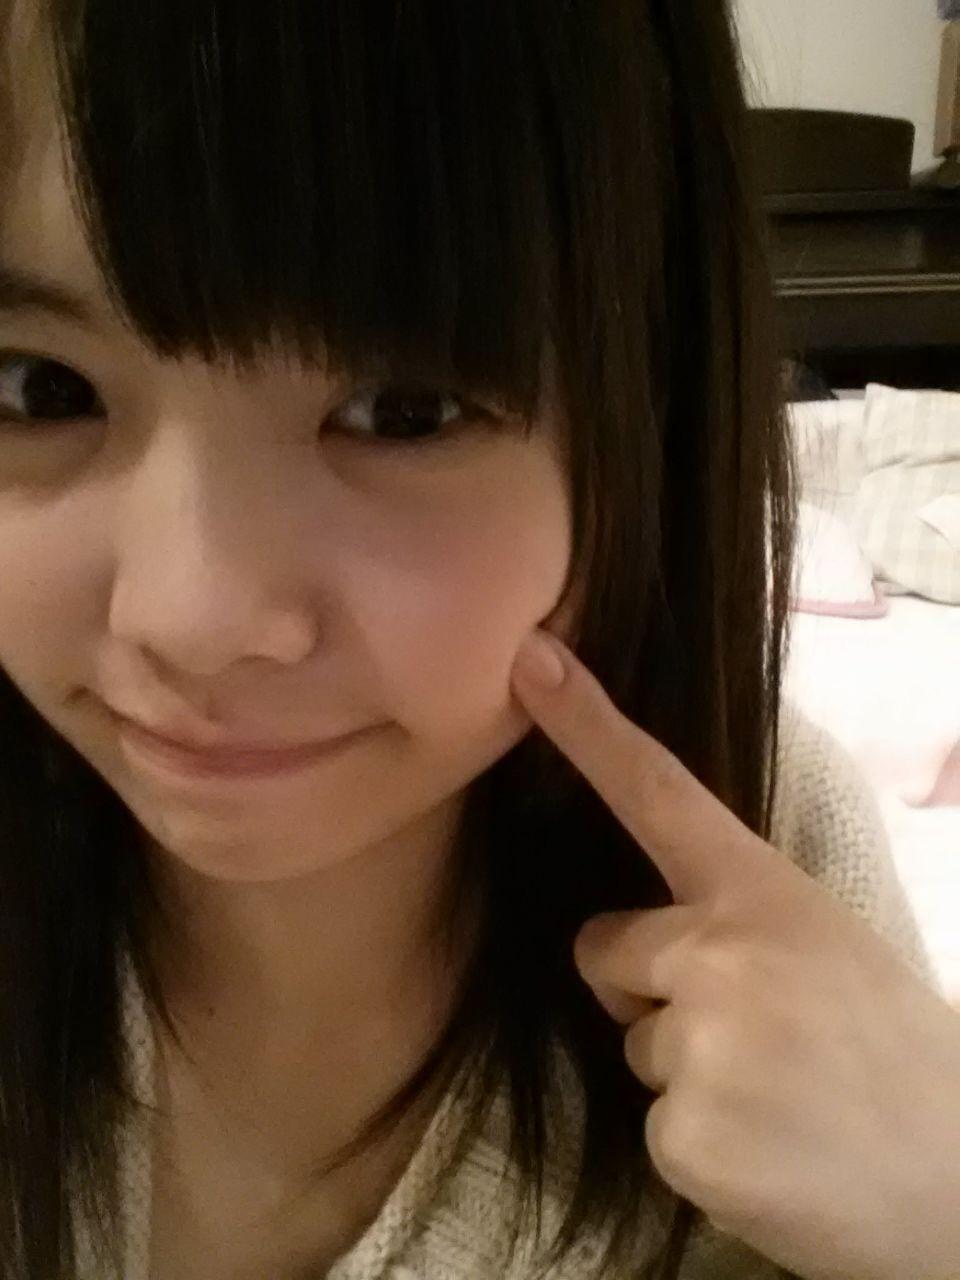 http://livedoor.blogimg.jp/otohaeika/imgs/8/4/84dfdf8a.jpg